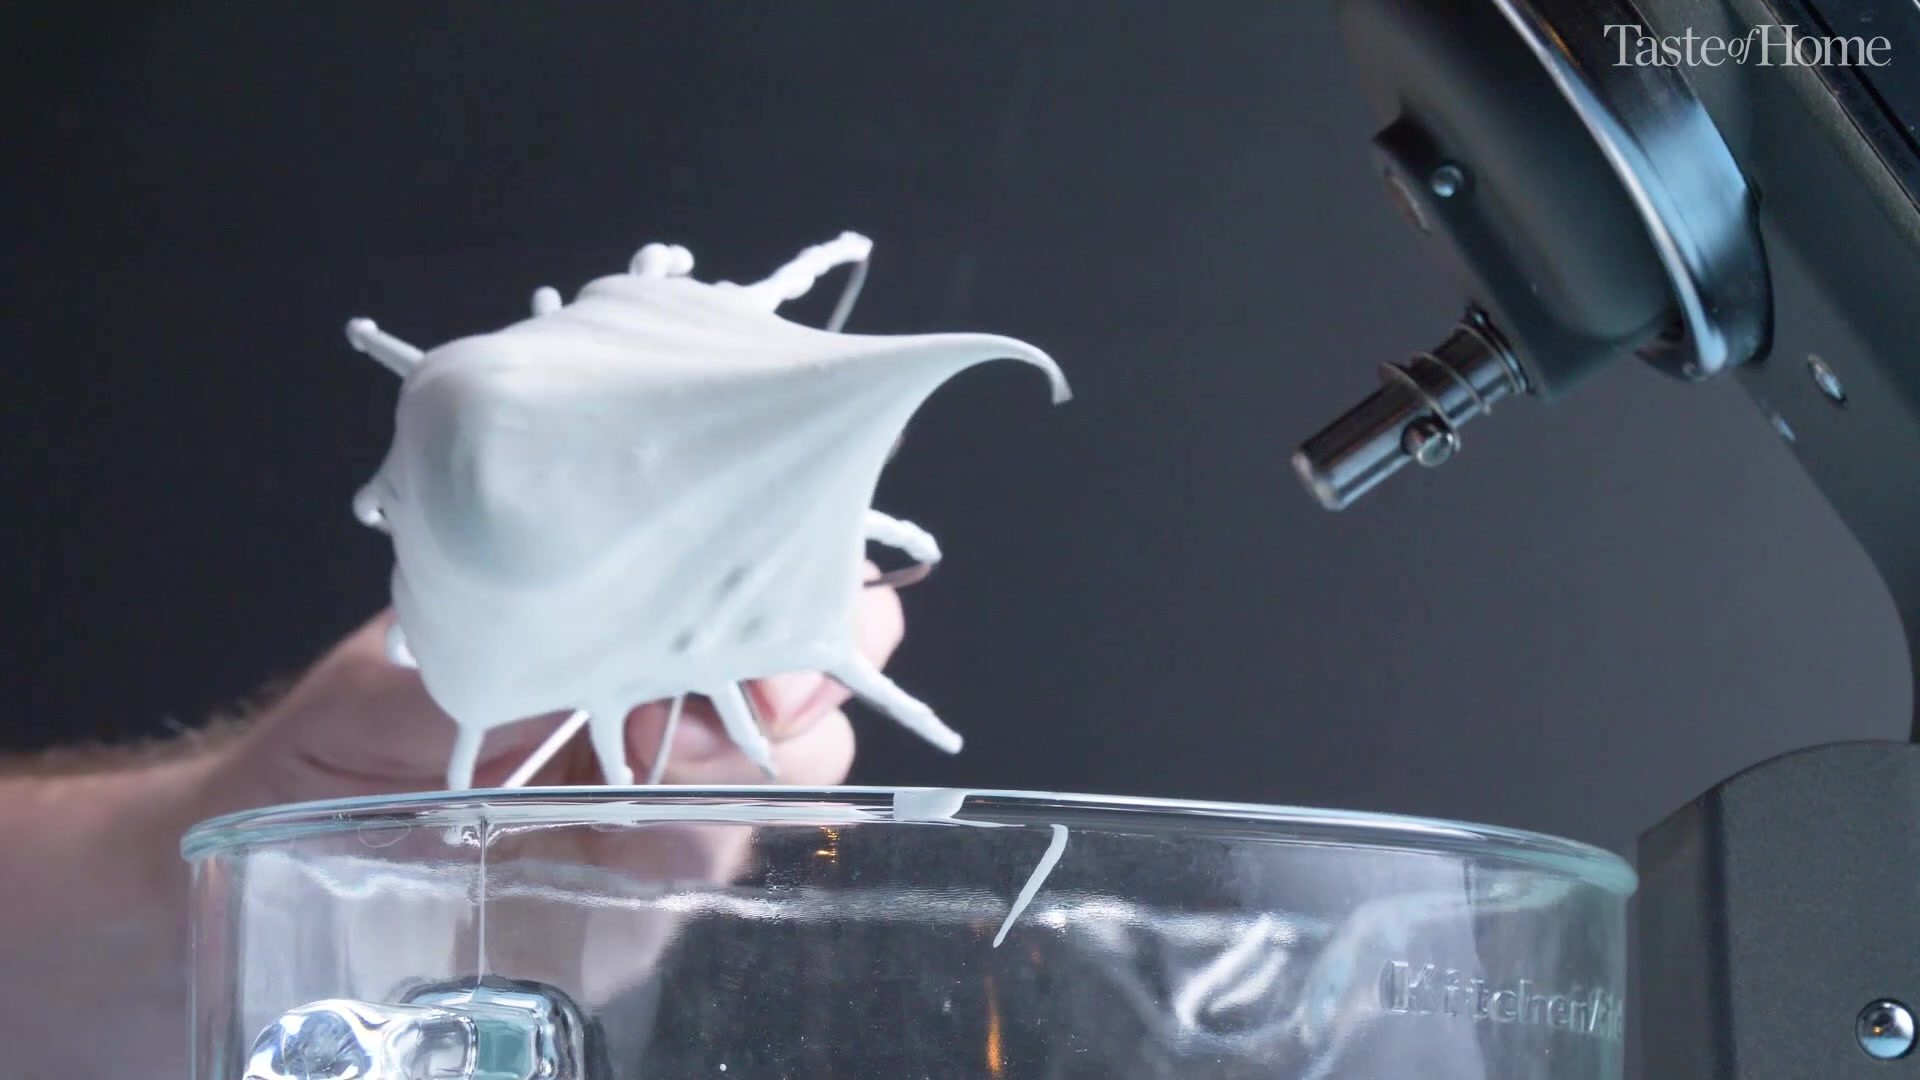 How to make macarons, stiff peak of meringue